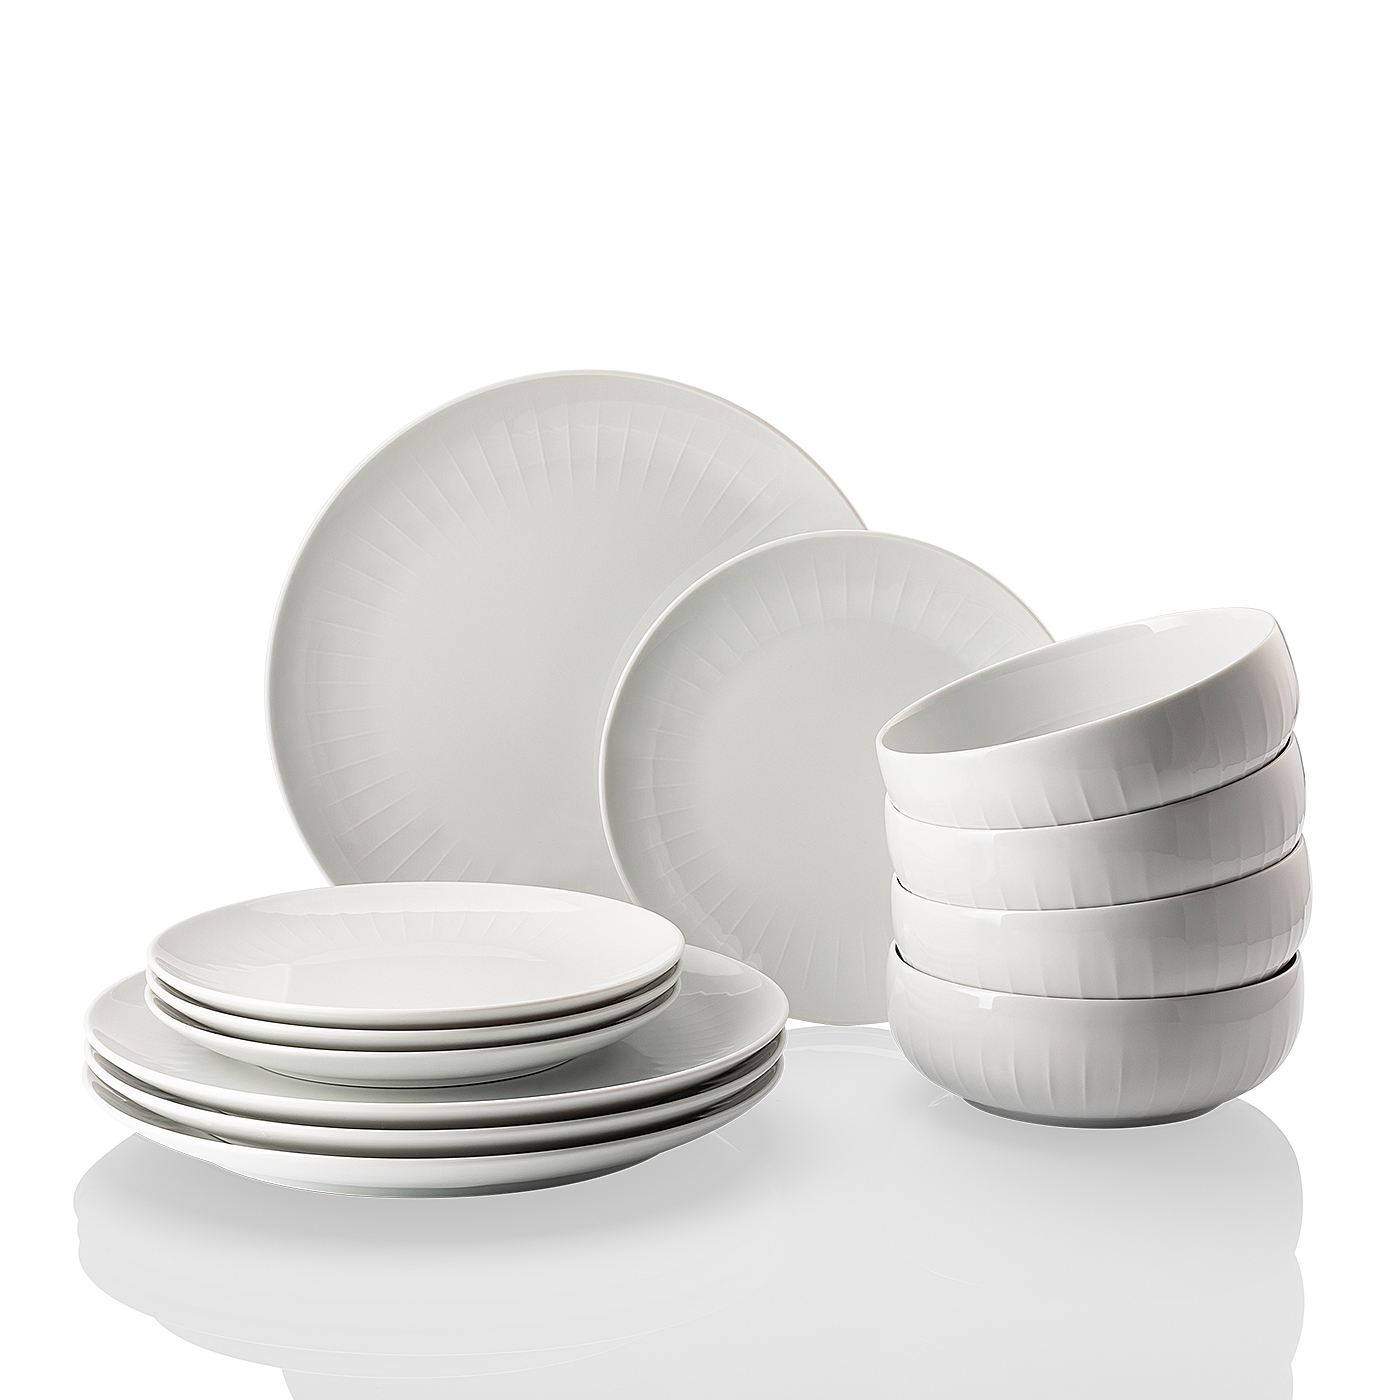 Dinnerset 12-tlg./GK Joyn Weiß Arzberg